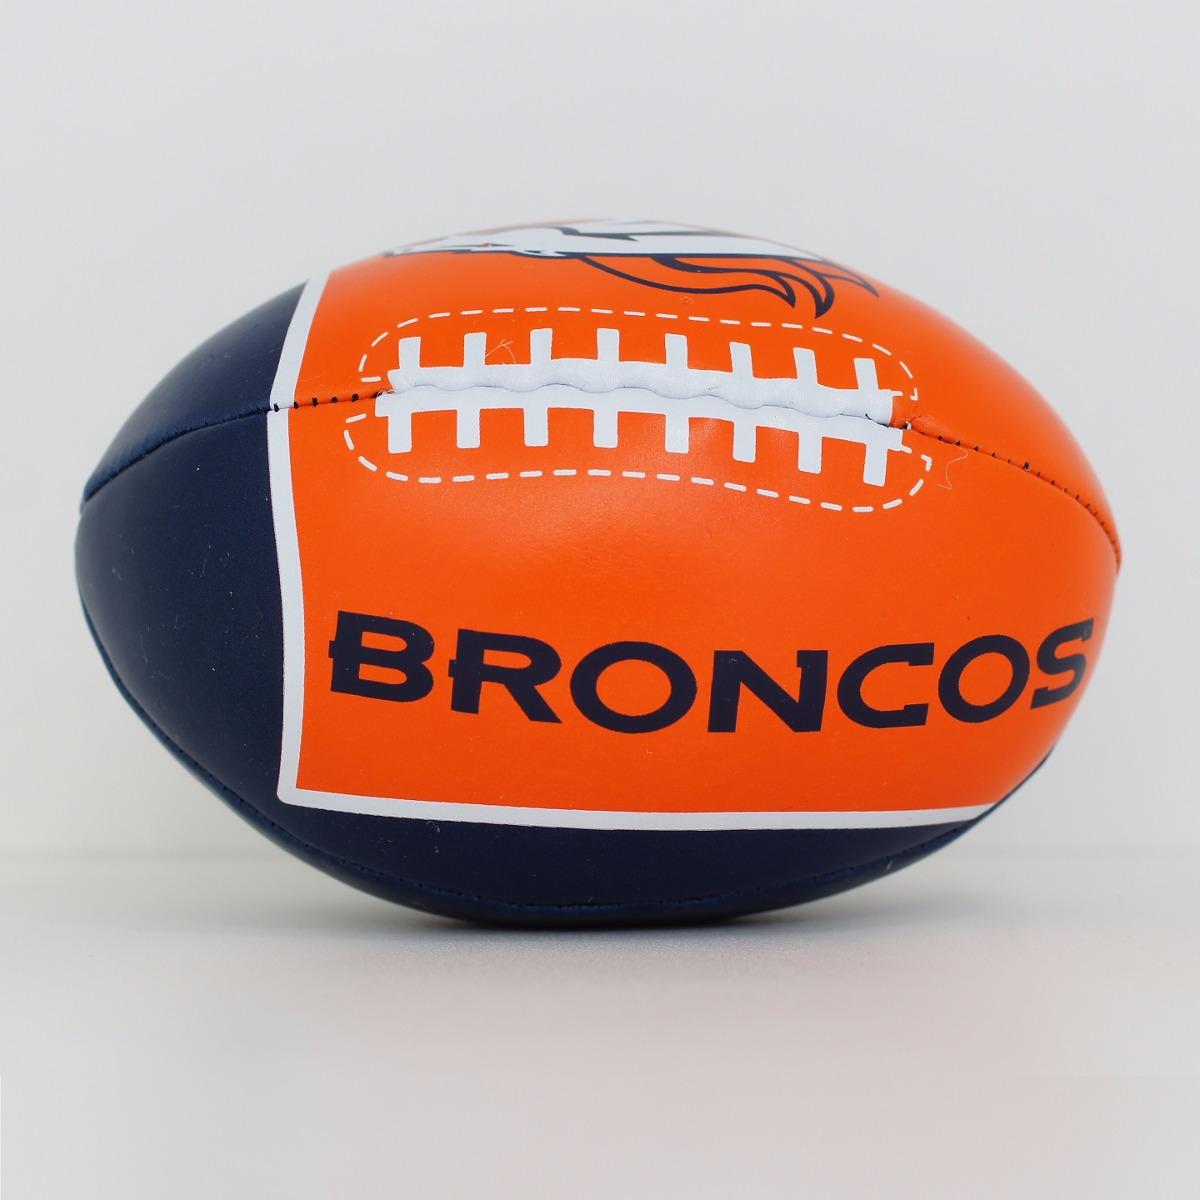 mini bola futebol americano - nfl - denver broncos. Carregando zoom... bola  futebol americano. Carregando zoom. c24f65f219ca2